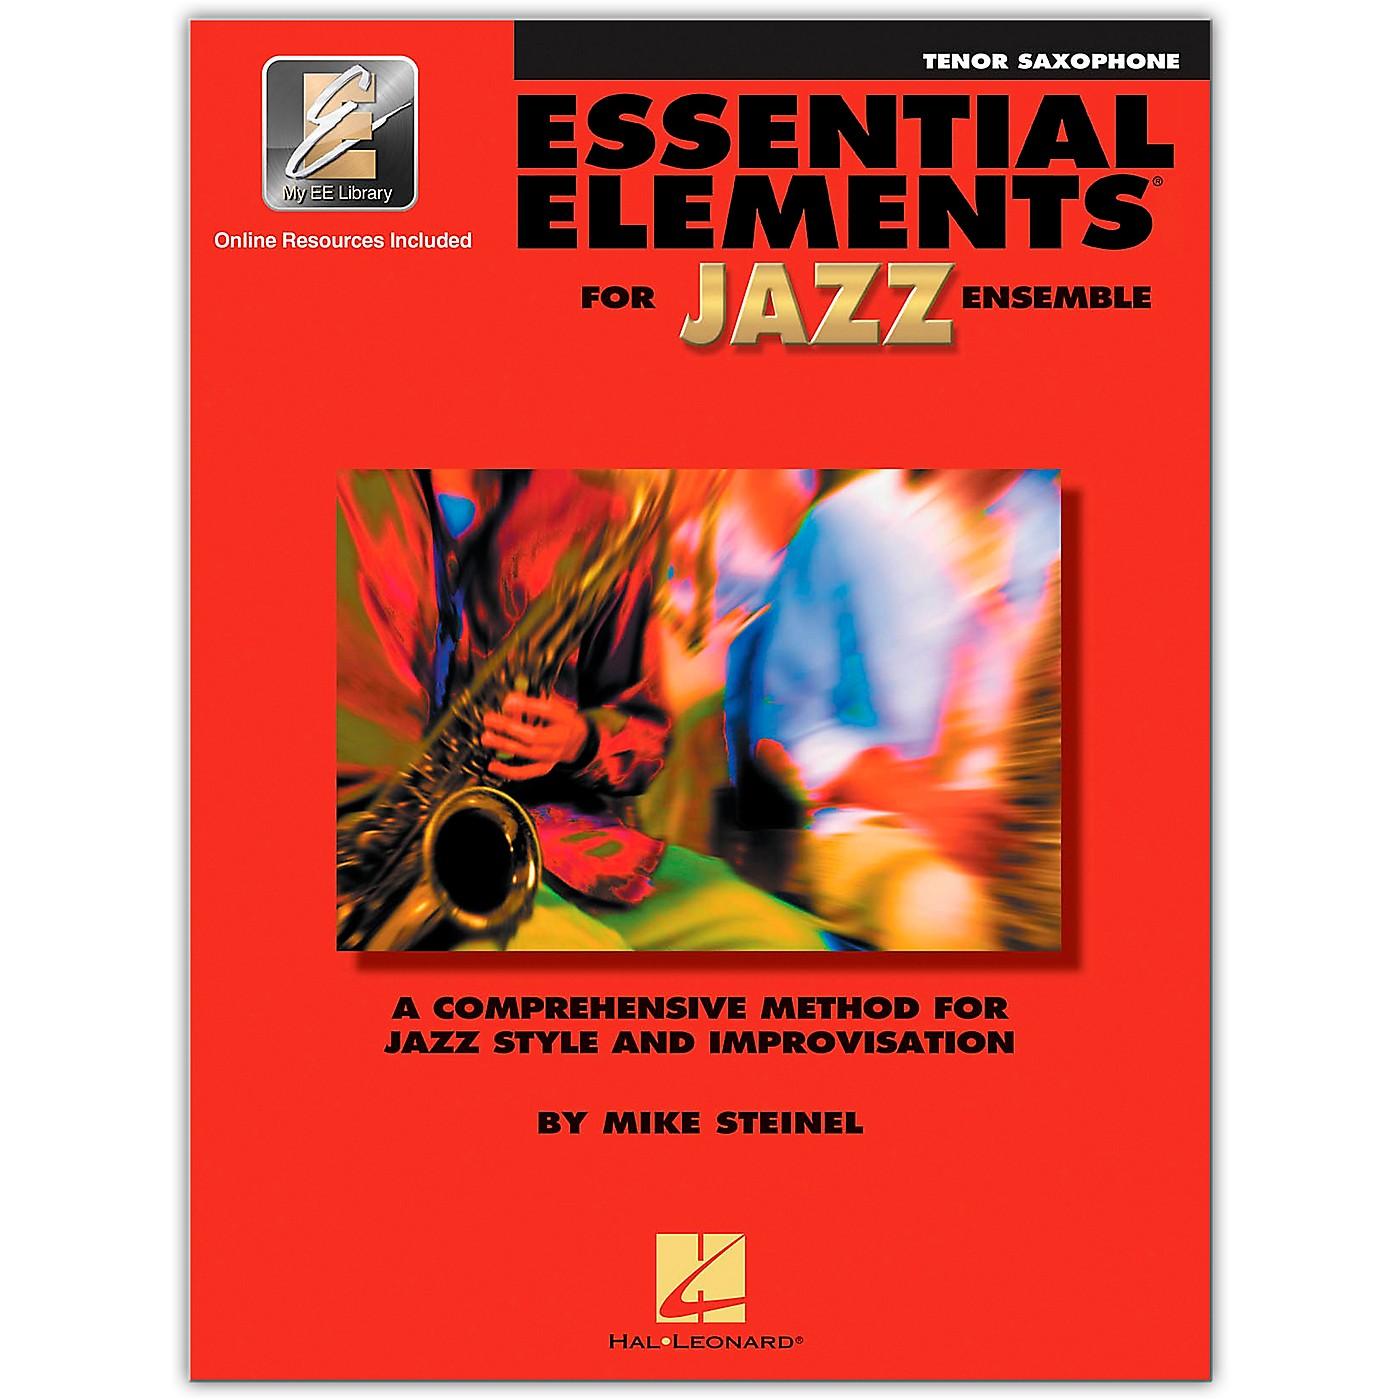 Hal Leonard Essential Elements for Jazz Ensemble - Bb Tenor Saxophone (Book/Online Audio) thumbnail